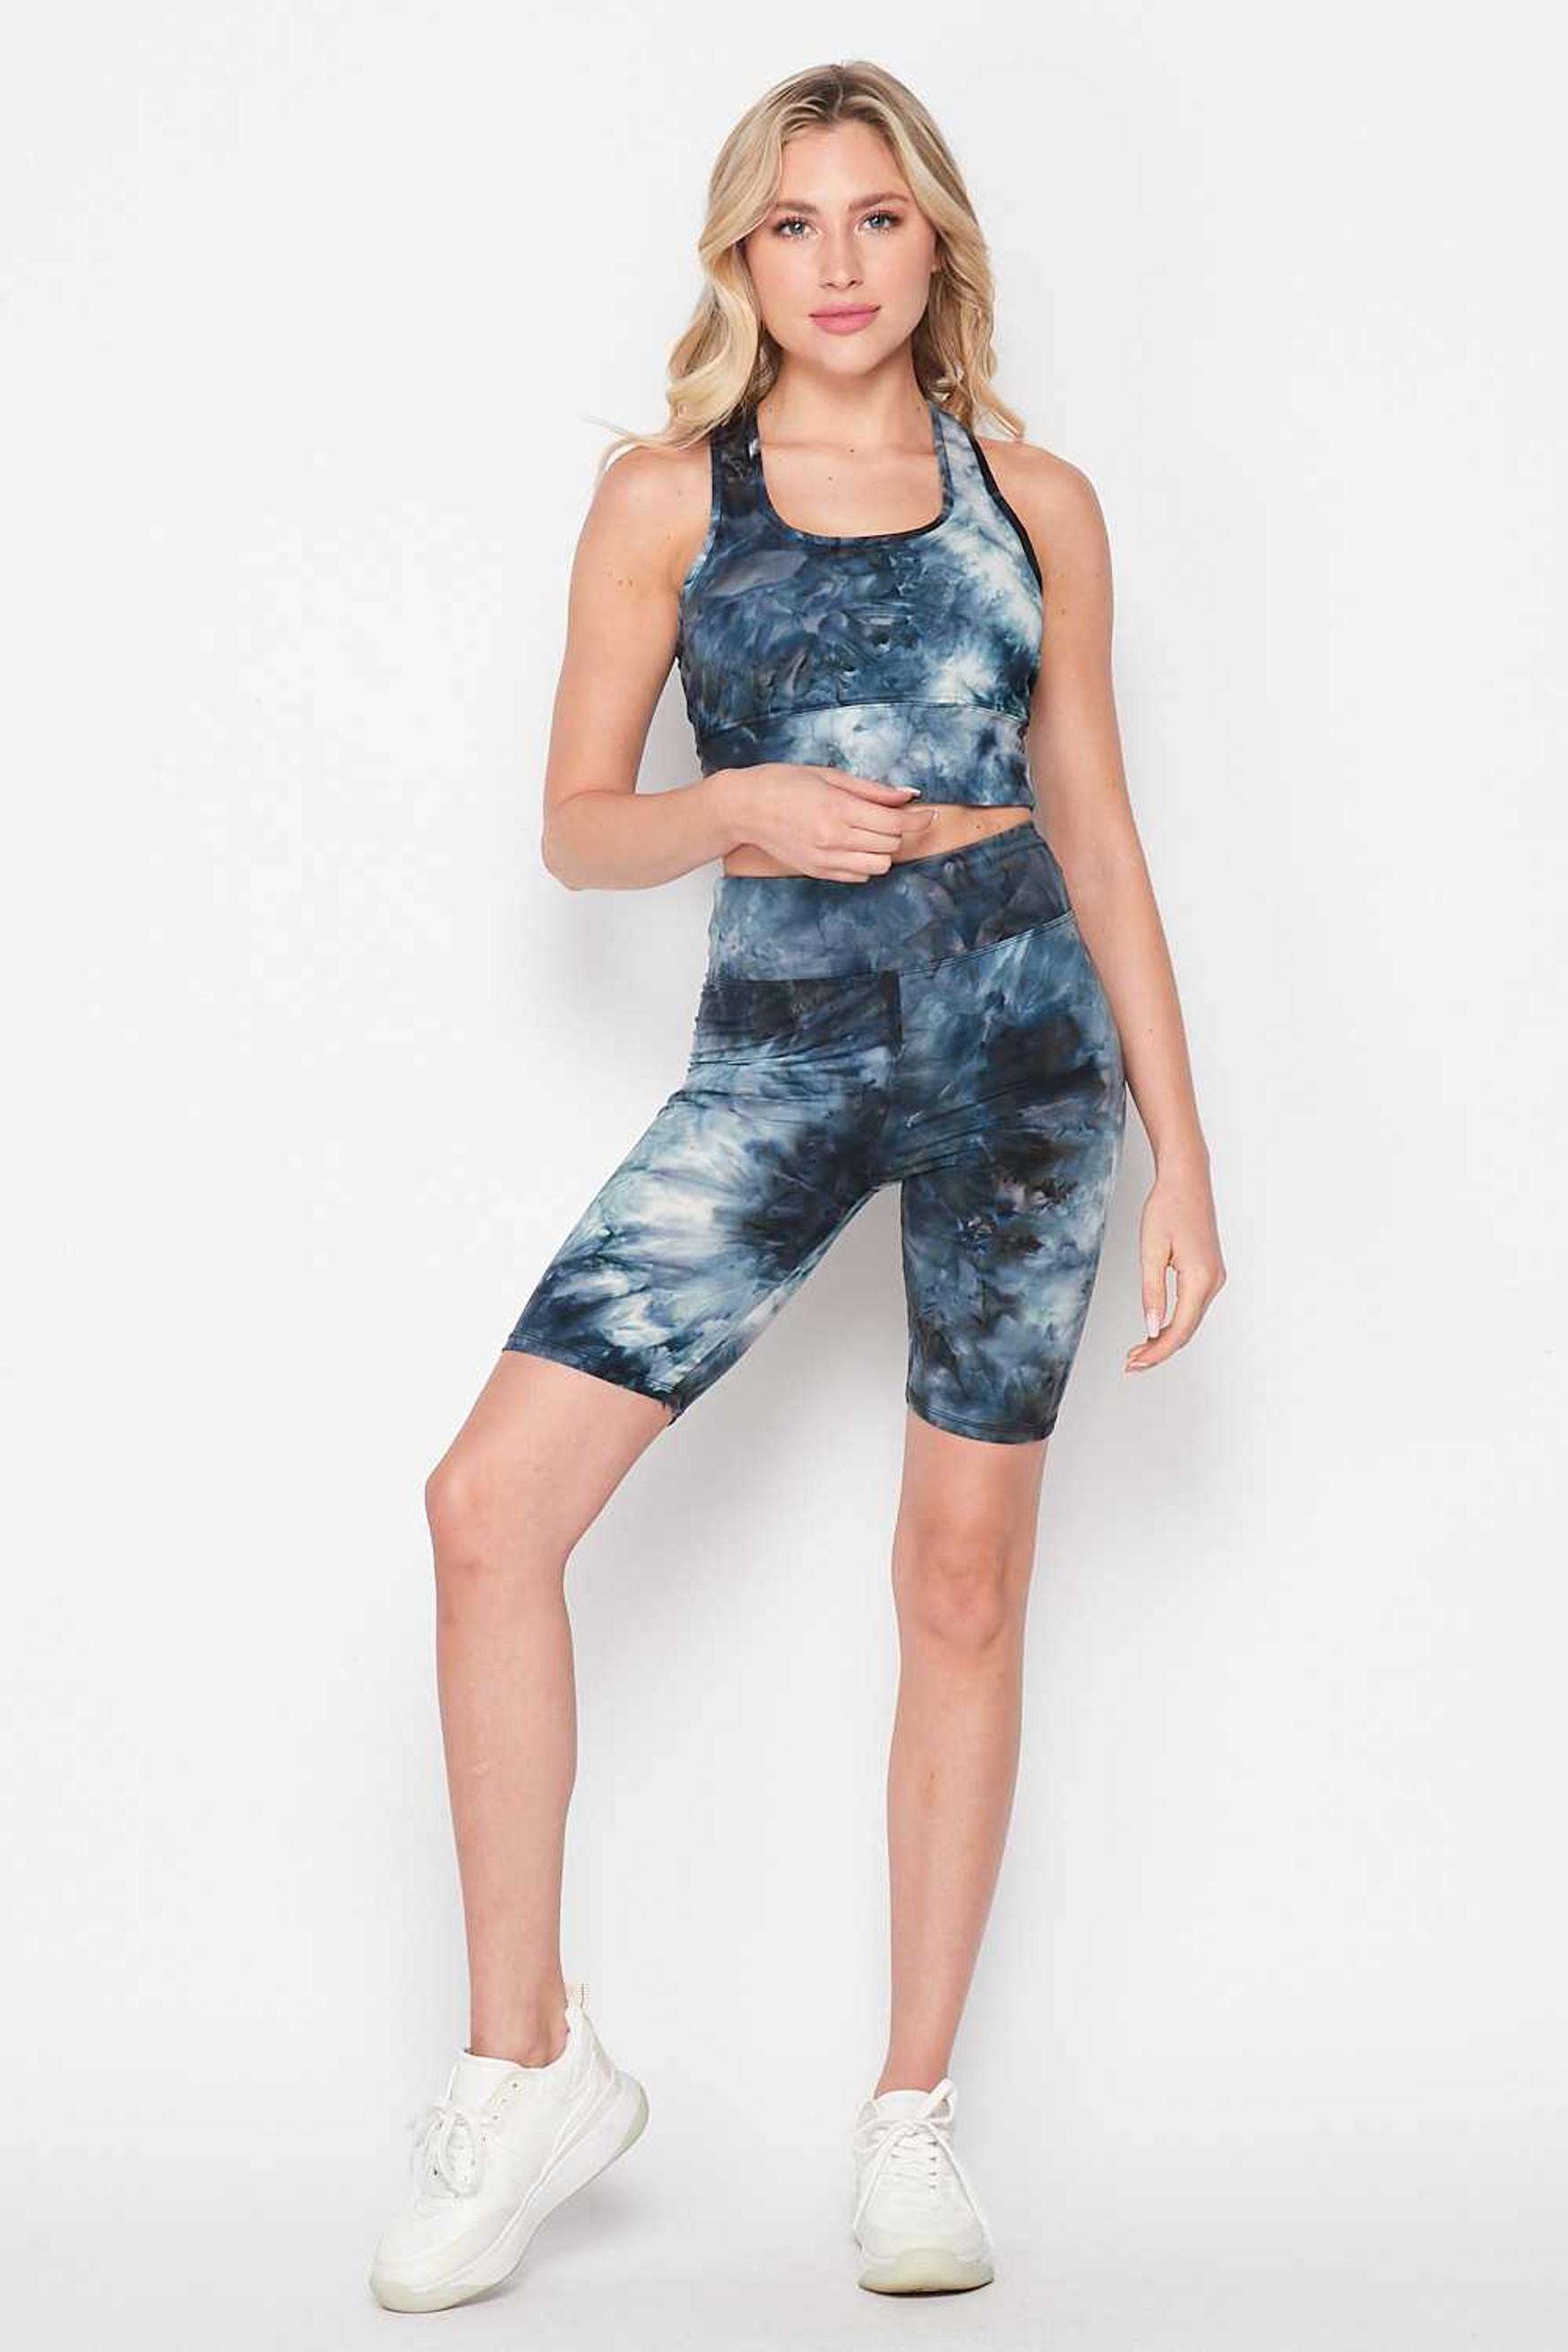 Navy Tie Dye 2 Piece High Waisted Biker Shorts and Crop Top Set